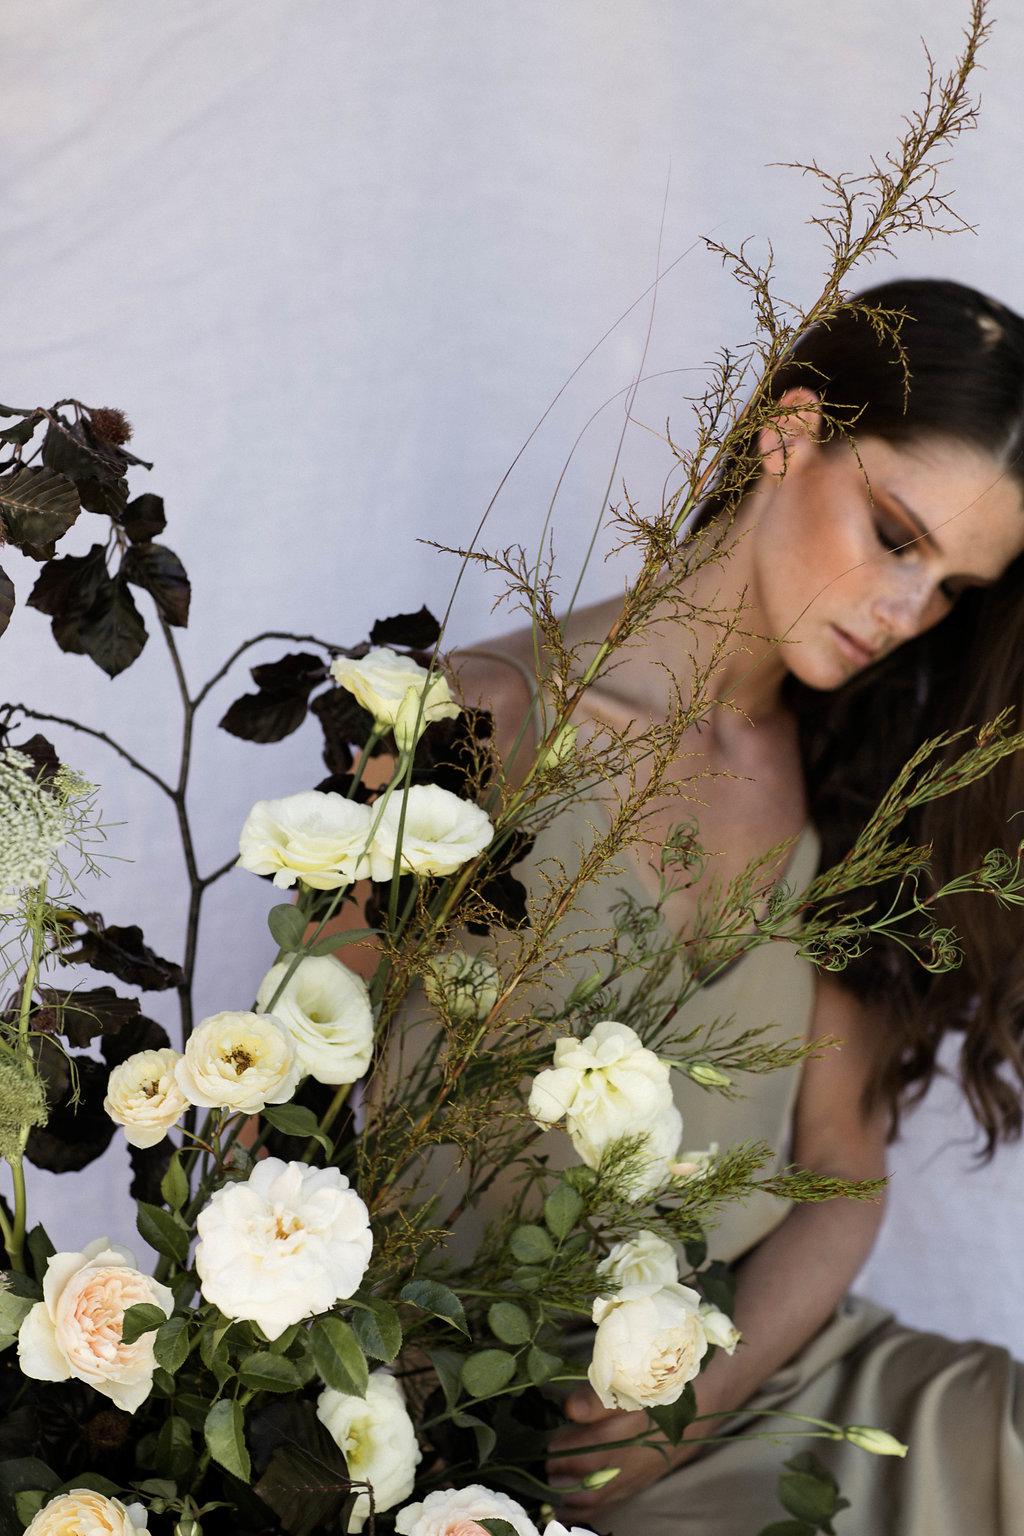 Bloodwood Botanica | Floral plinth shoot